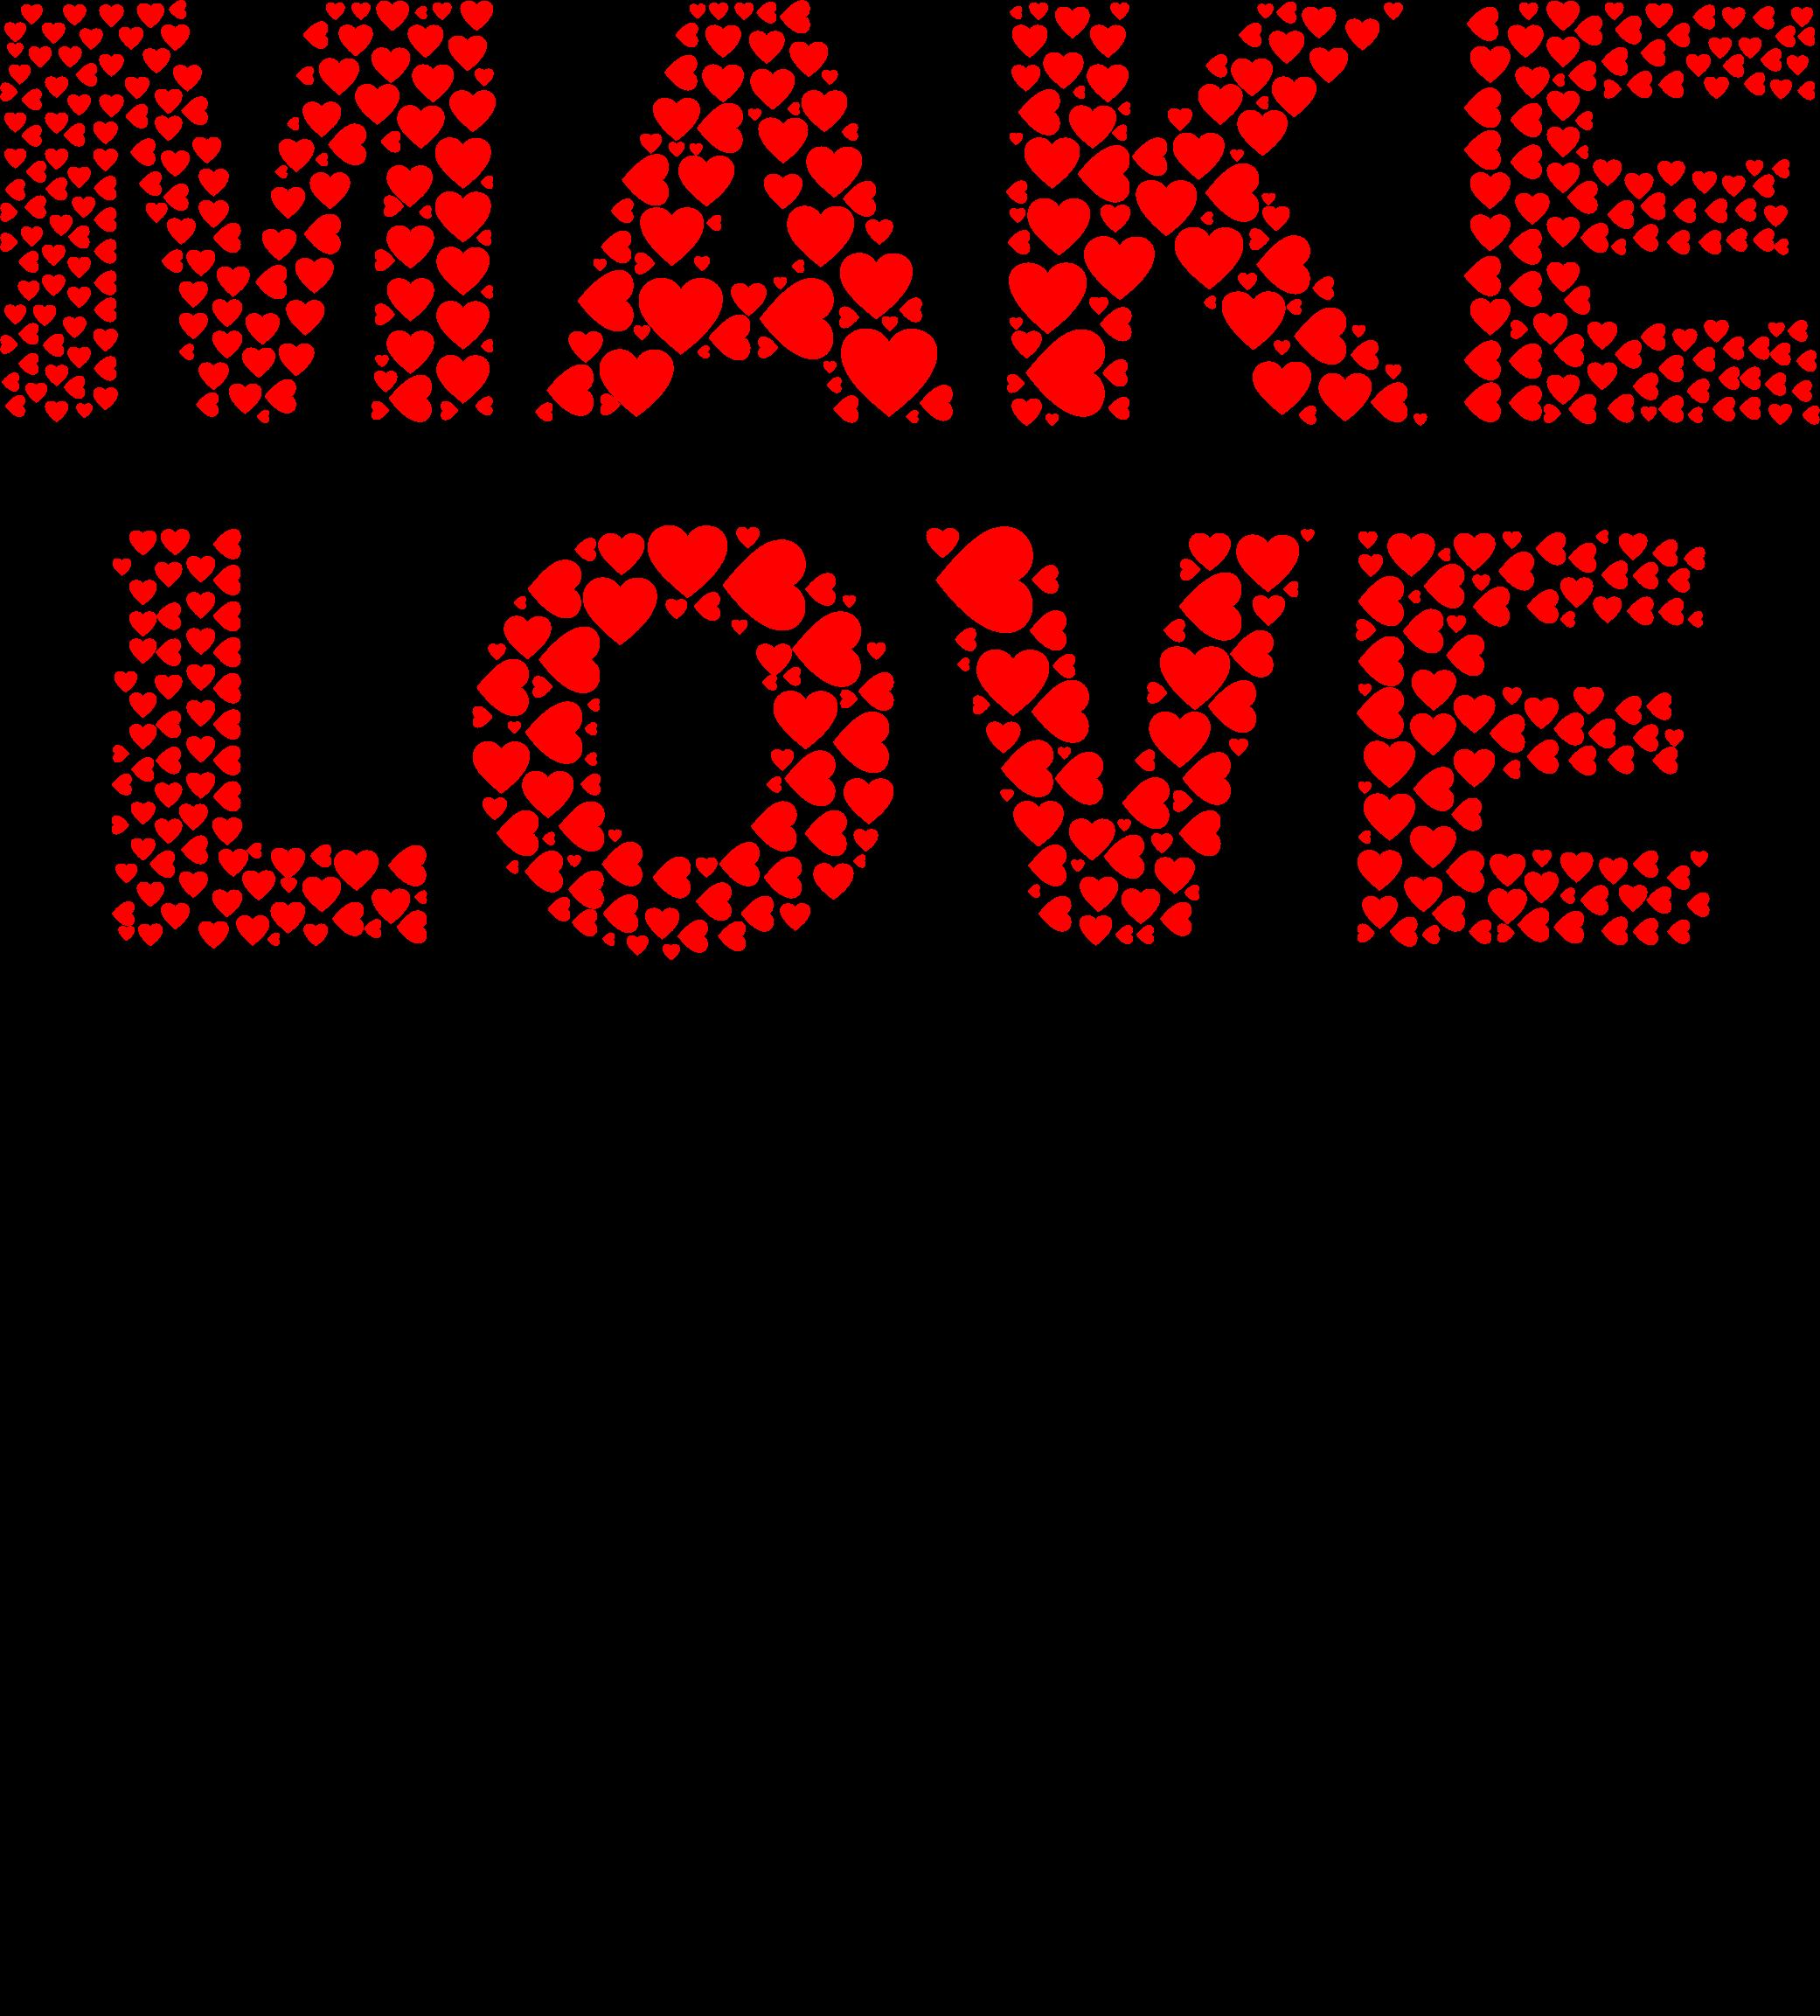 Peace clipart word wisdom. Make love not war